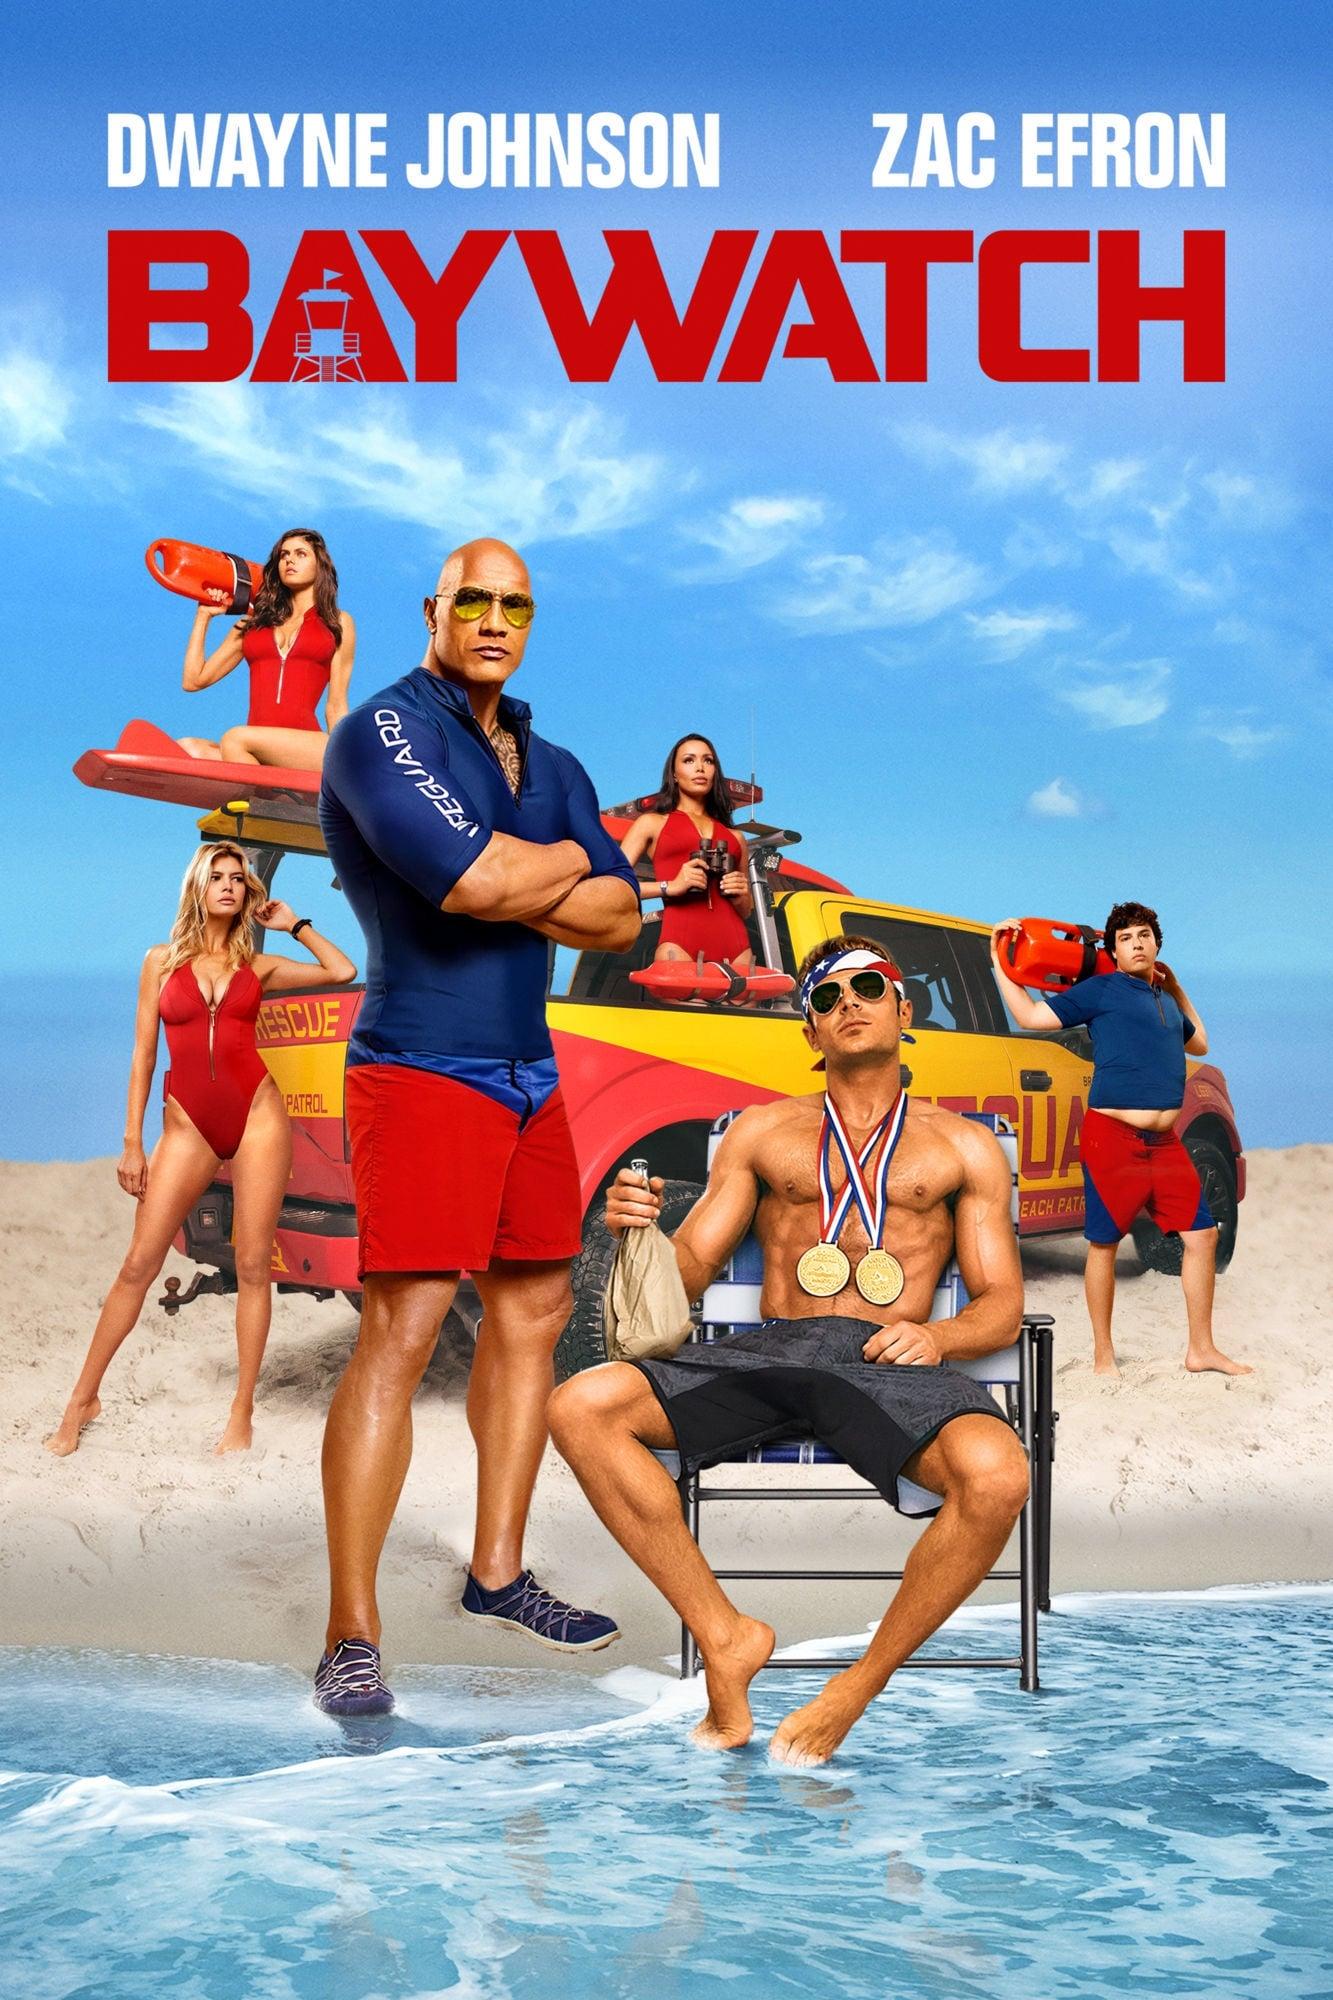 Baywatch (Film)